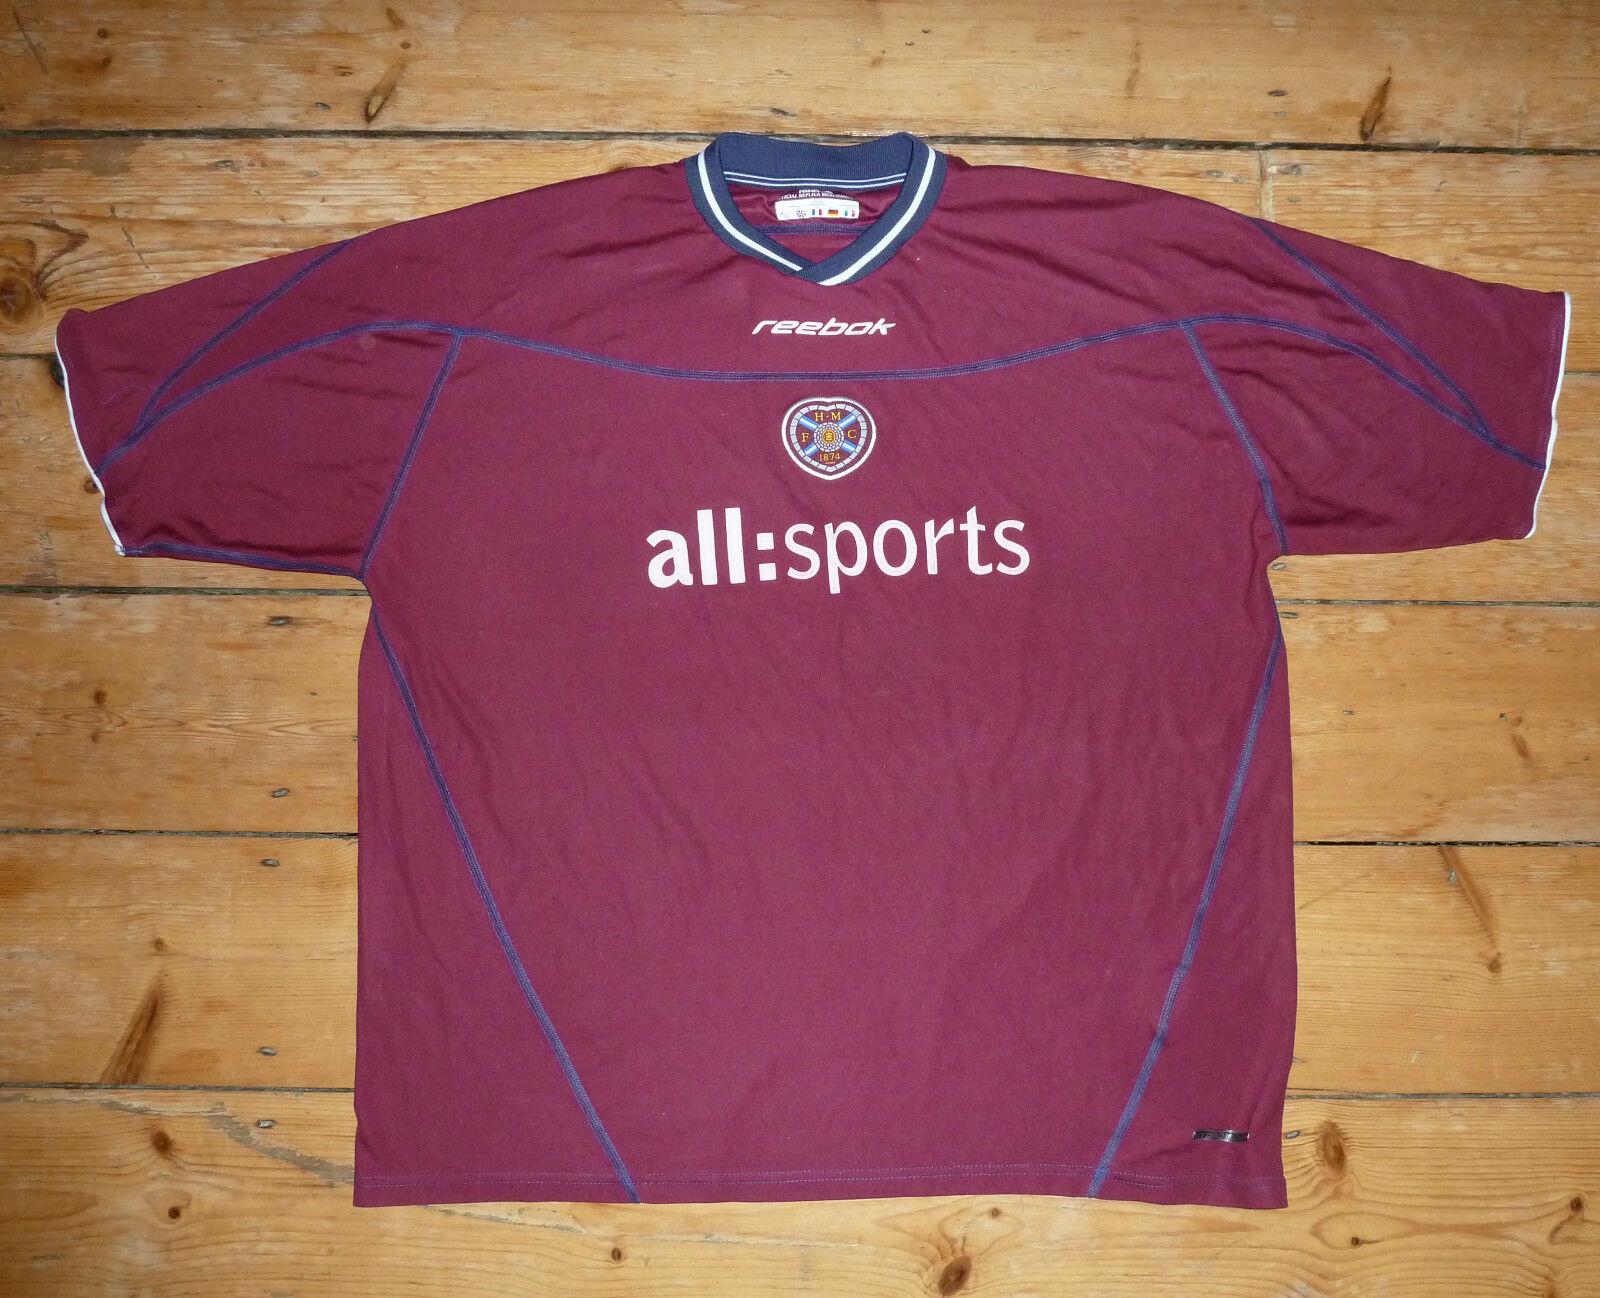 Dimensione 3XL Heart Of Midlothian hearts football shirt soccer jersey Jambos 200203